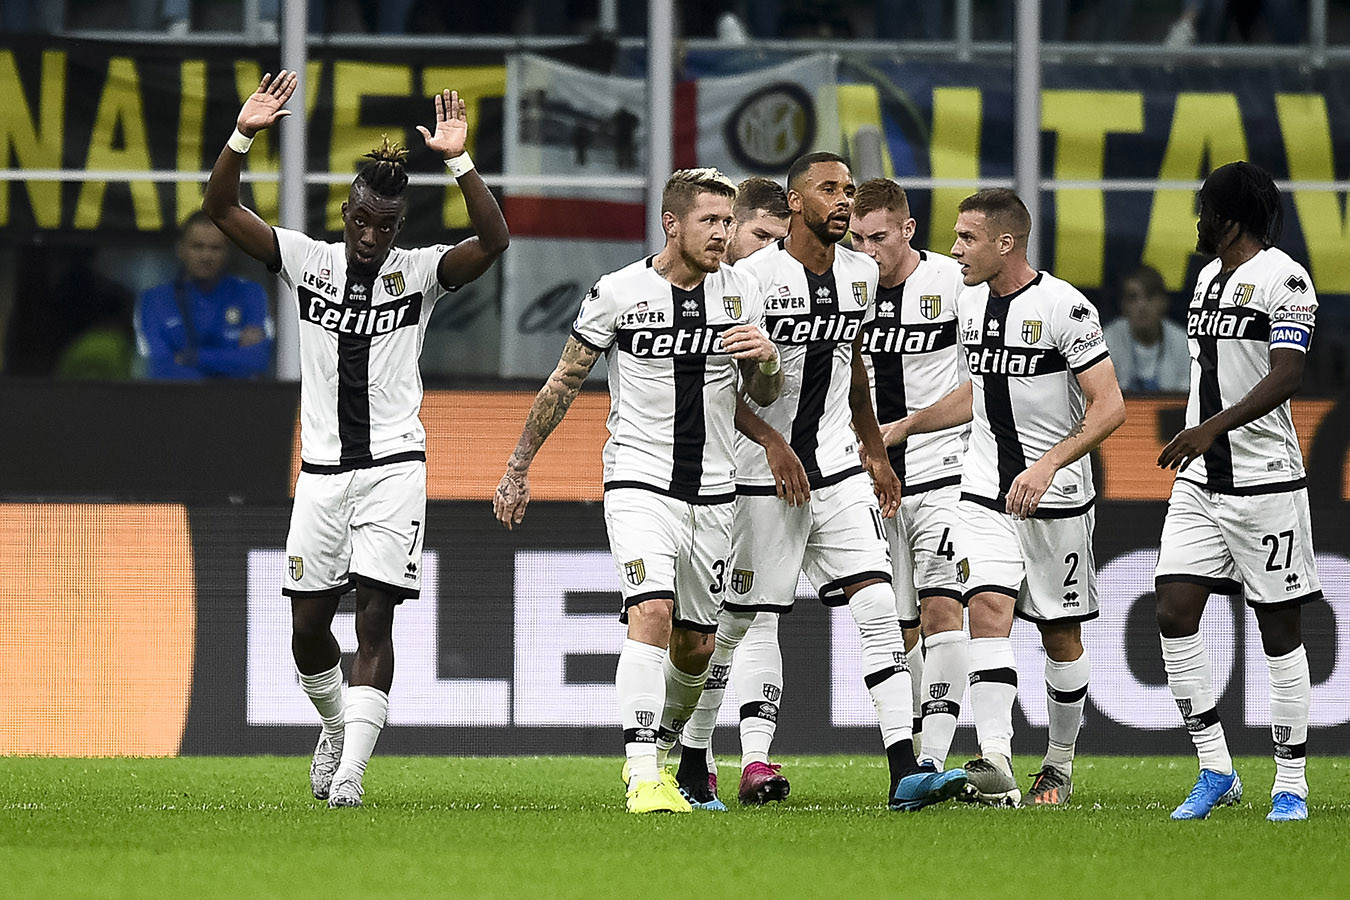 «Рома» — «Парма». Прогноз: Эрнани, Бруну Алвеш и Жервиньо помогут «Милану» с «Ювентусом»